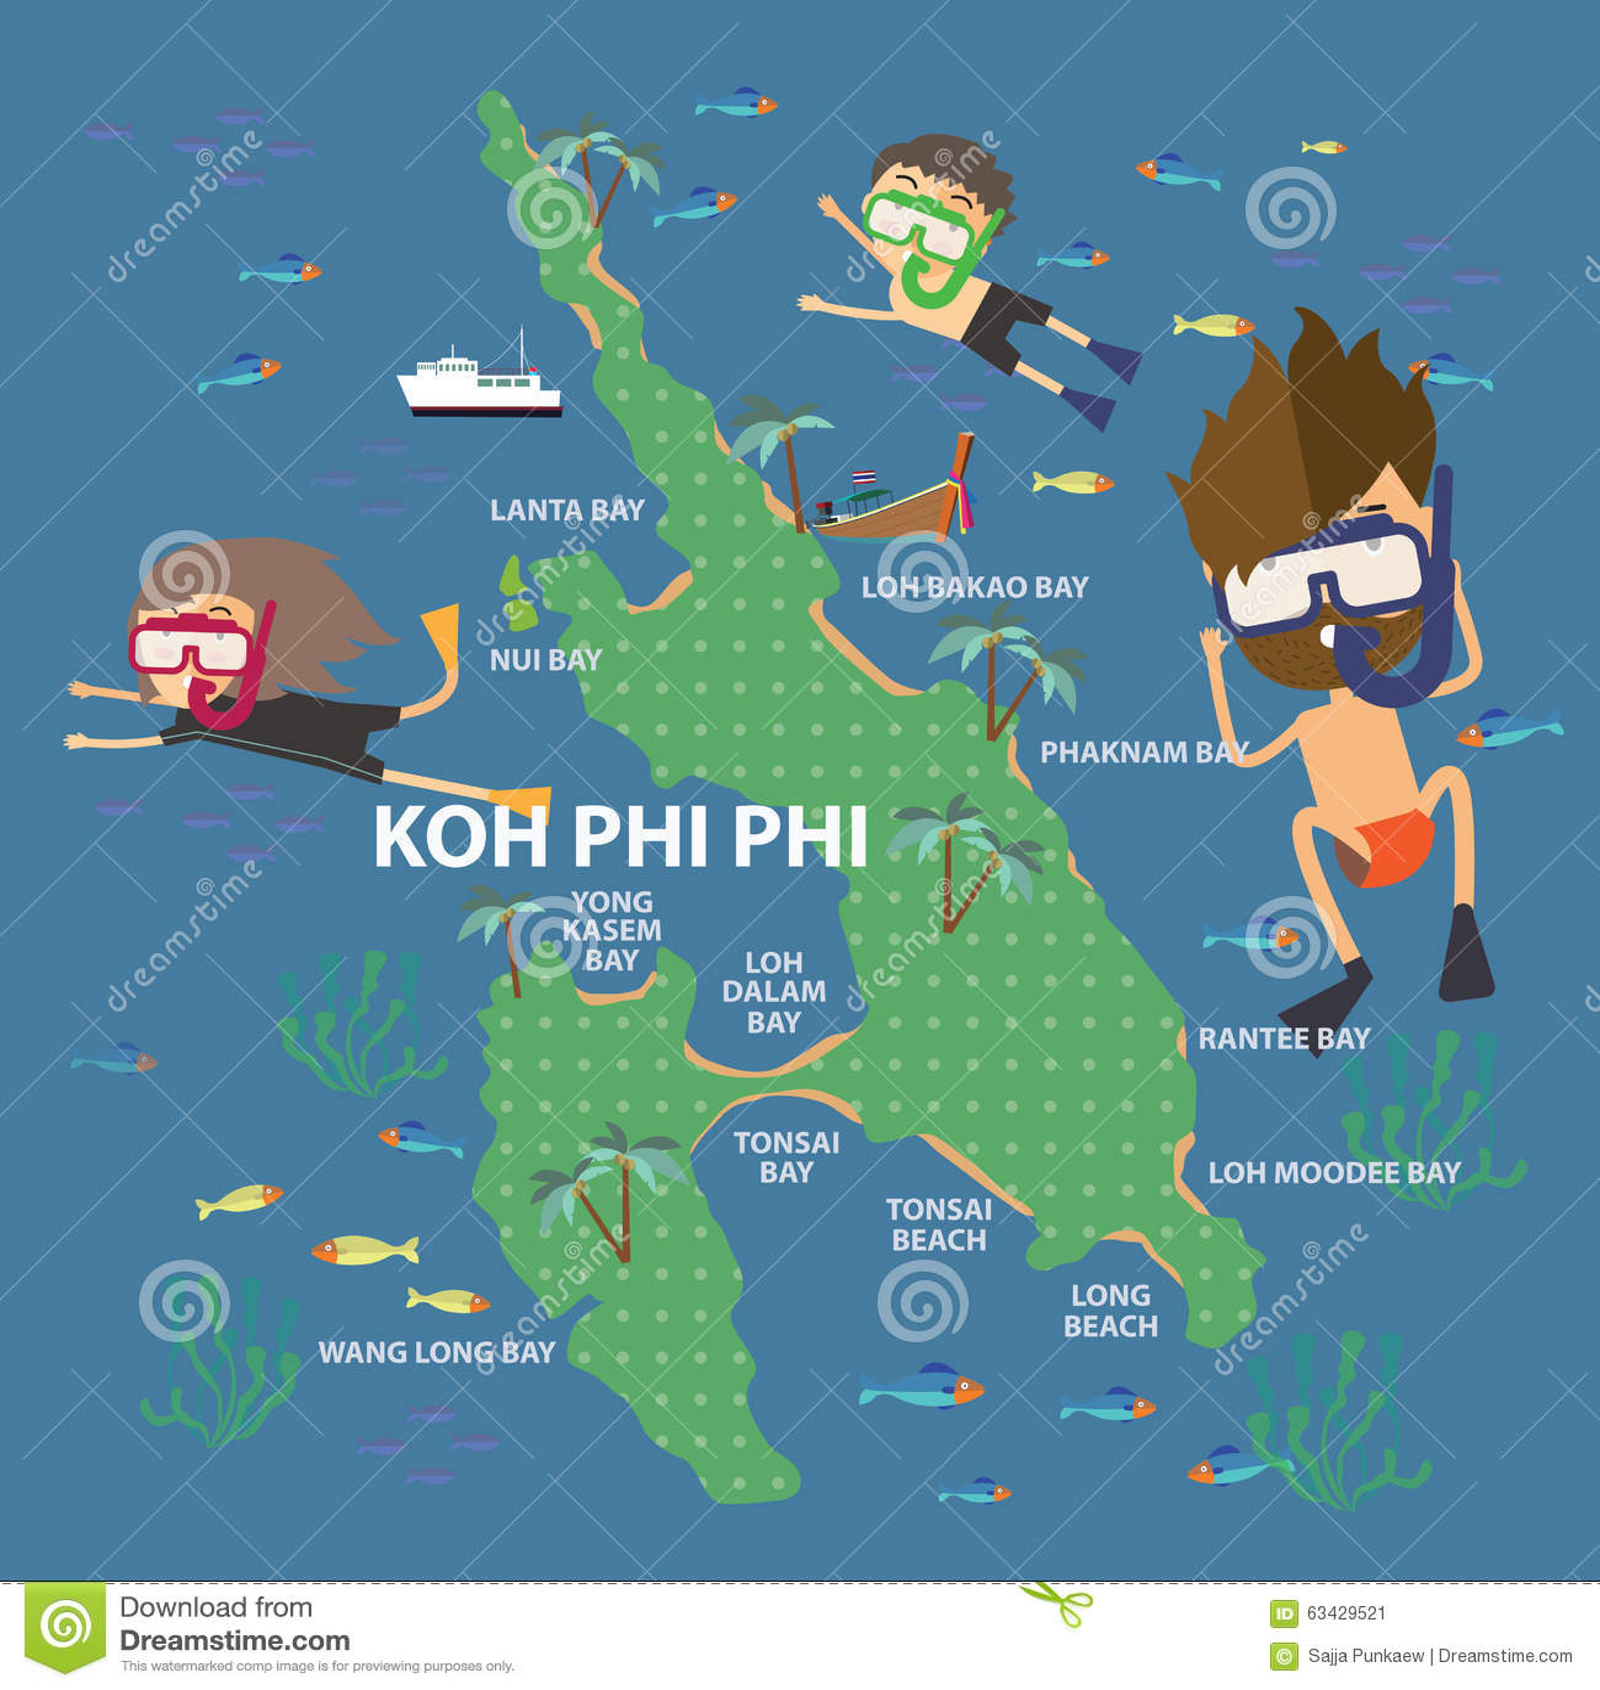 Long Beach Koh Phi Phi: Travel To Phi Phi Island Thailand Stock Vector